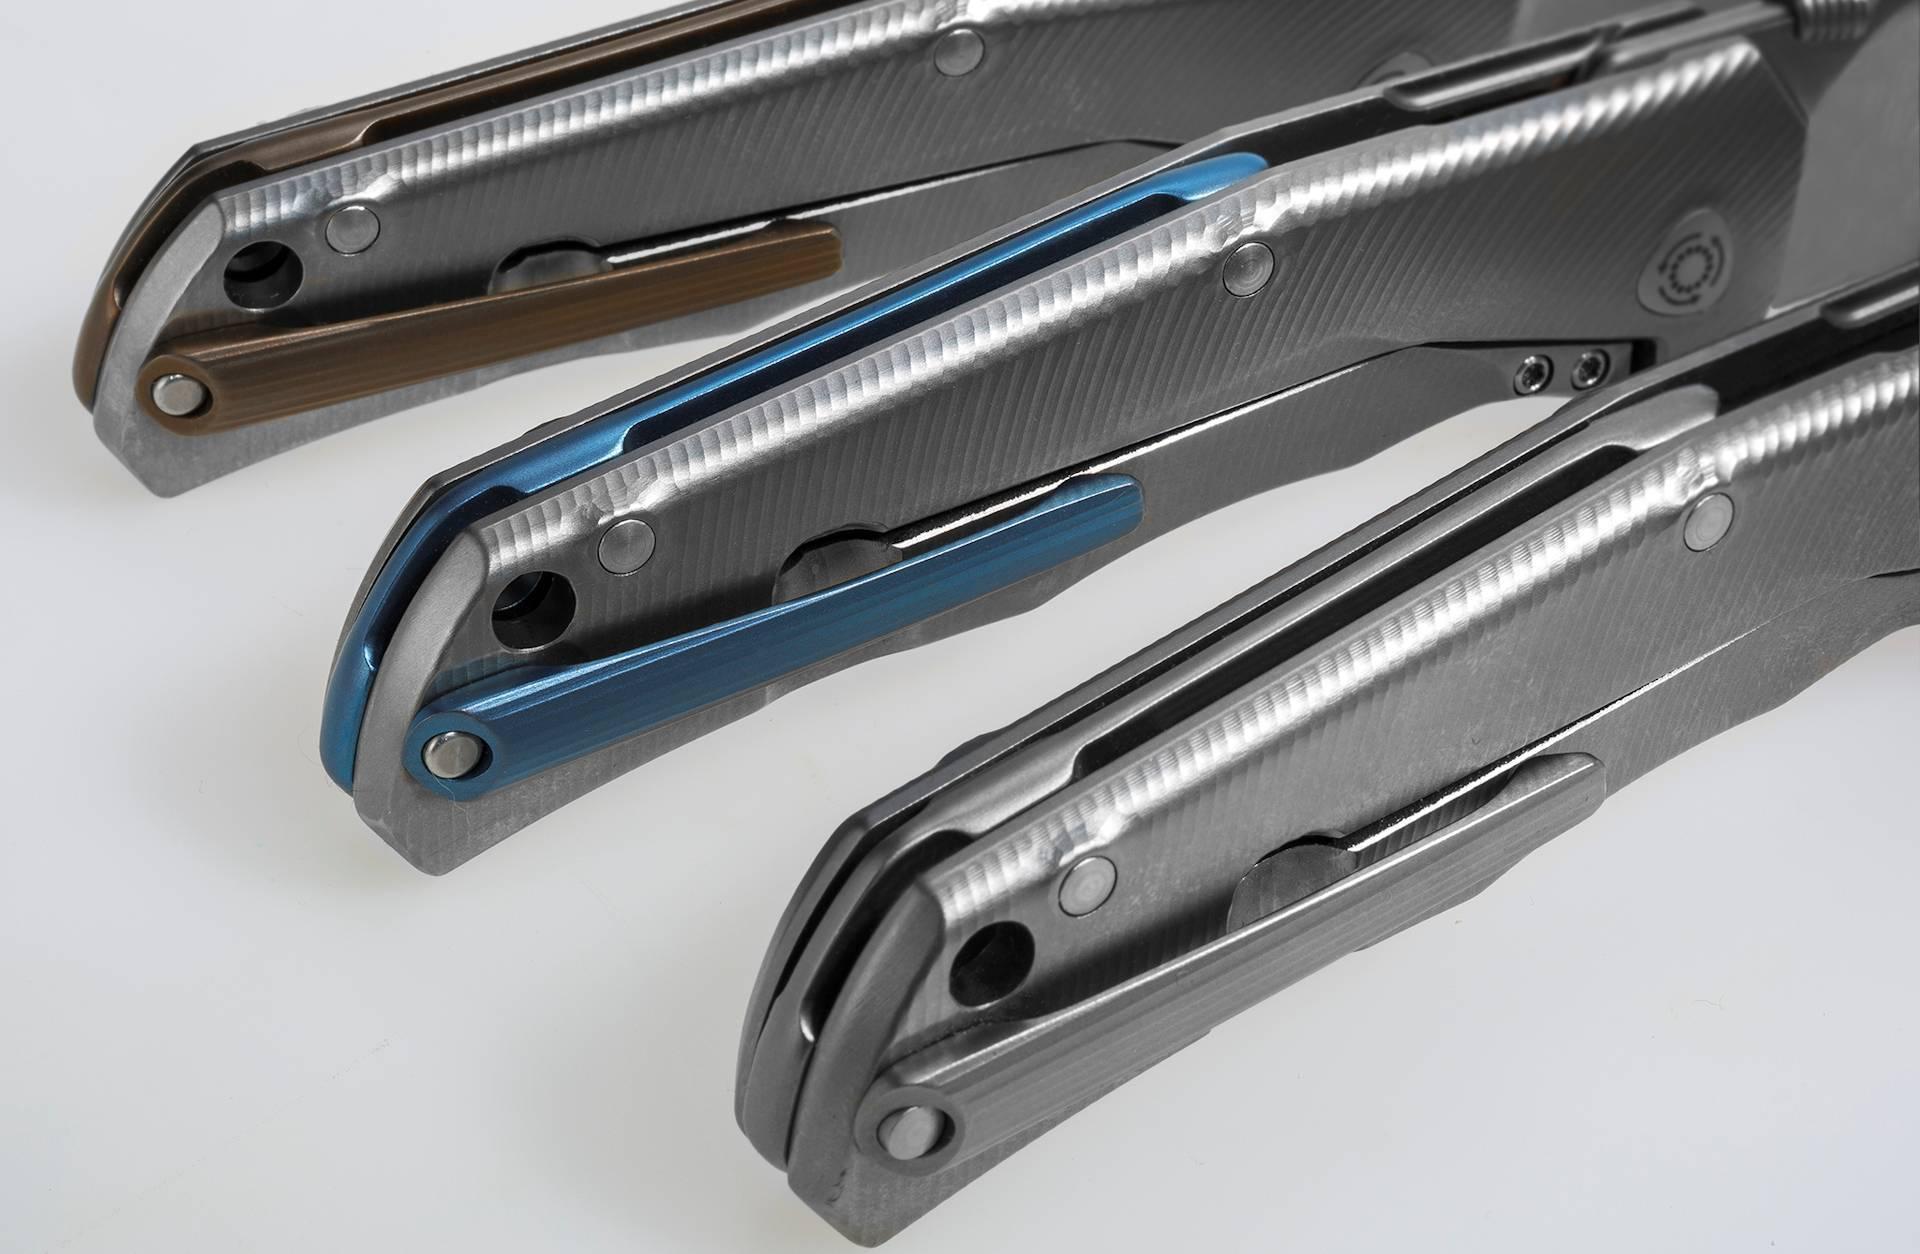 Фото 2 - Нож складной T.R.E. BR - Three Rapid Exchange (IKBS® Flipper), Matte Titanium Handles, Bronze Accents от Lion Steel